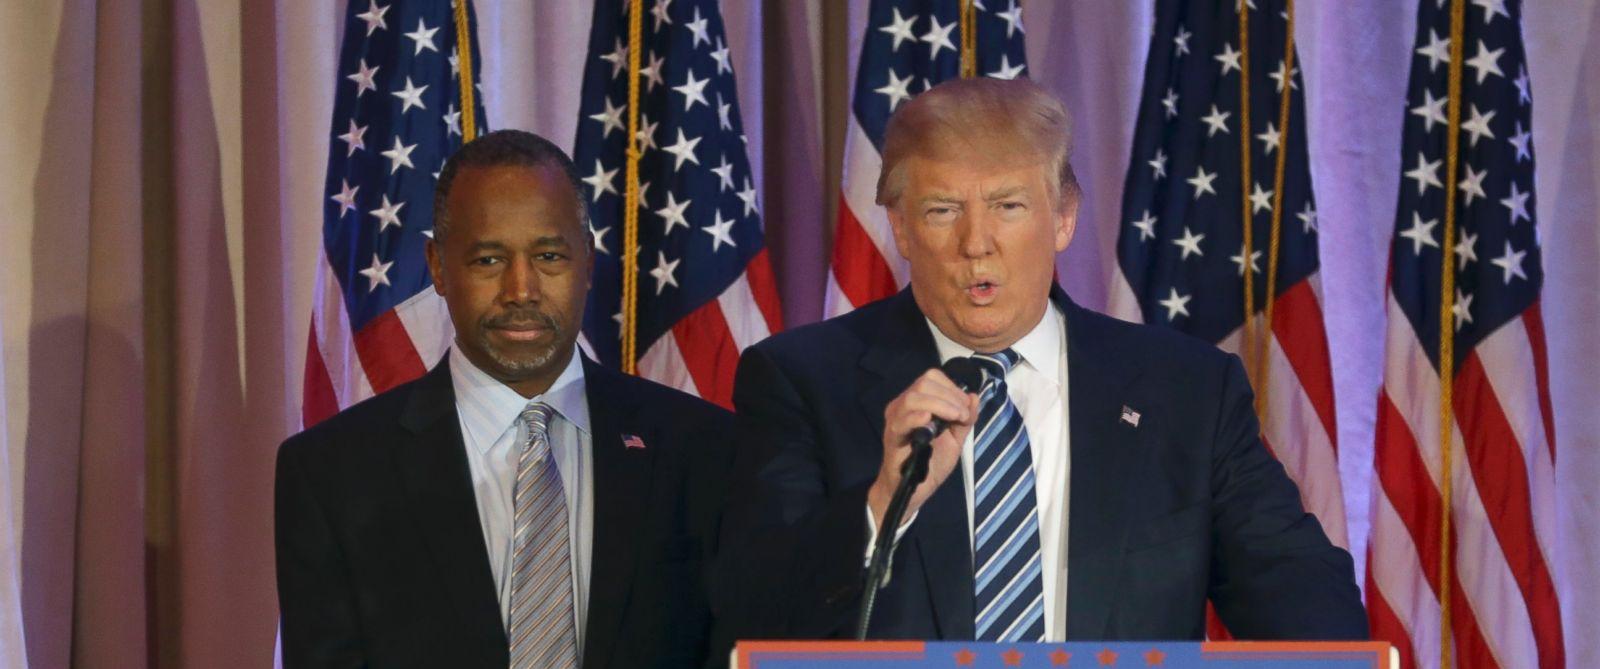 Trump Announces Ben Carson as HUD Pick - ABC Columbia